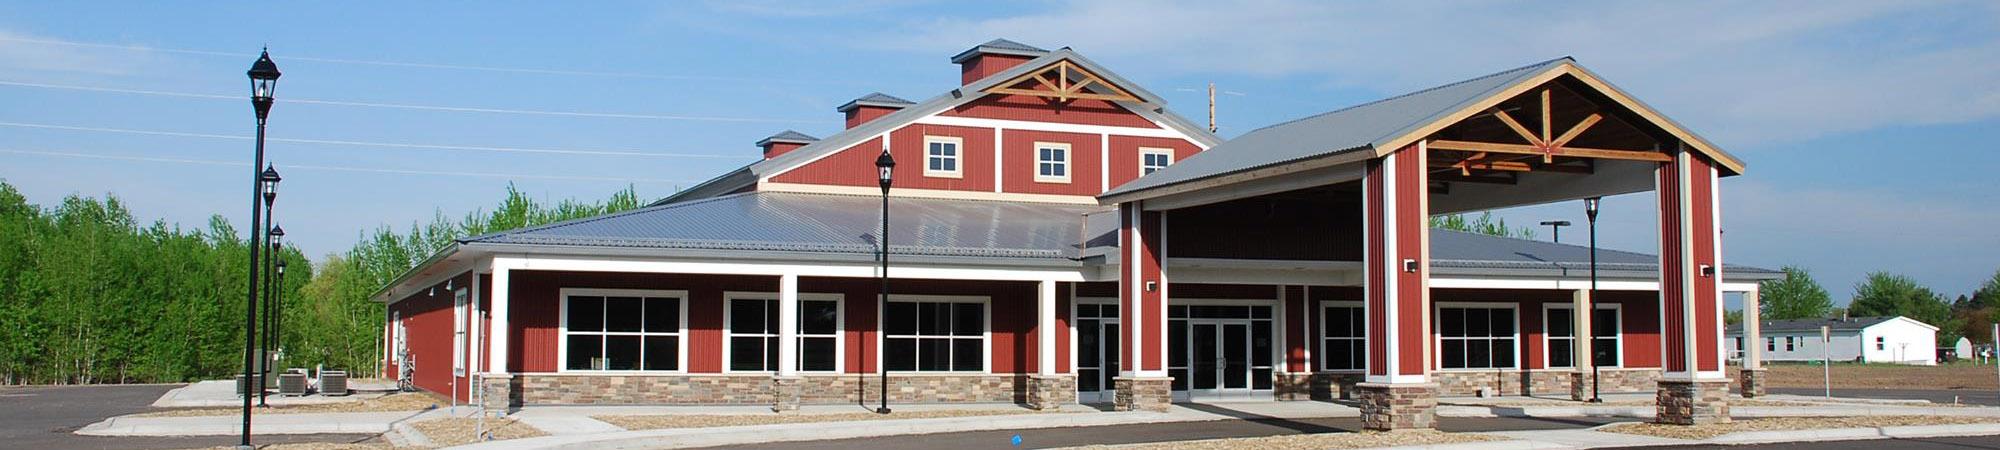 Braham Event Center, Braham, MN  Events and Weddings.